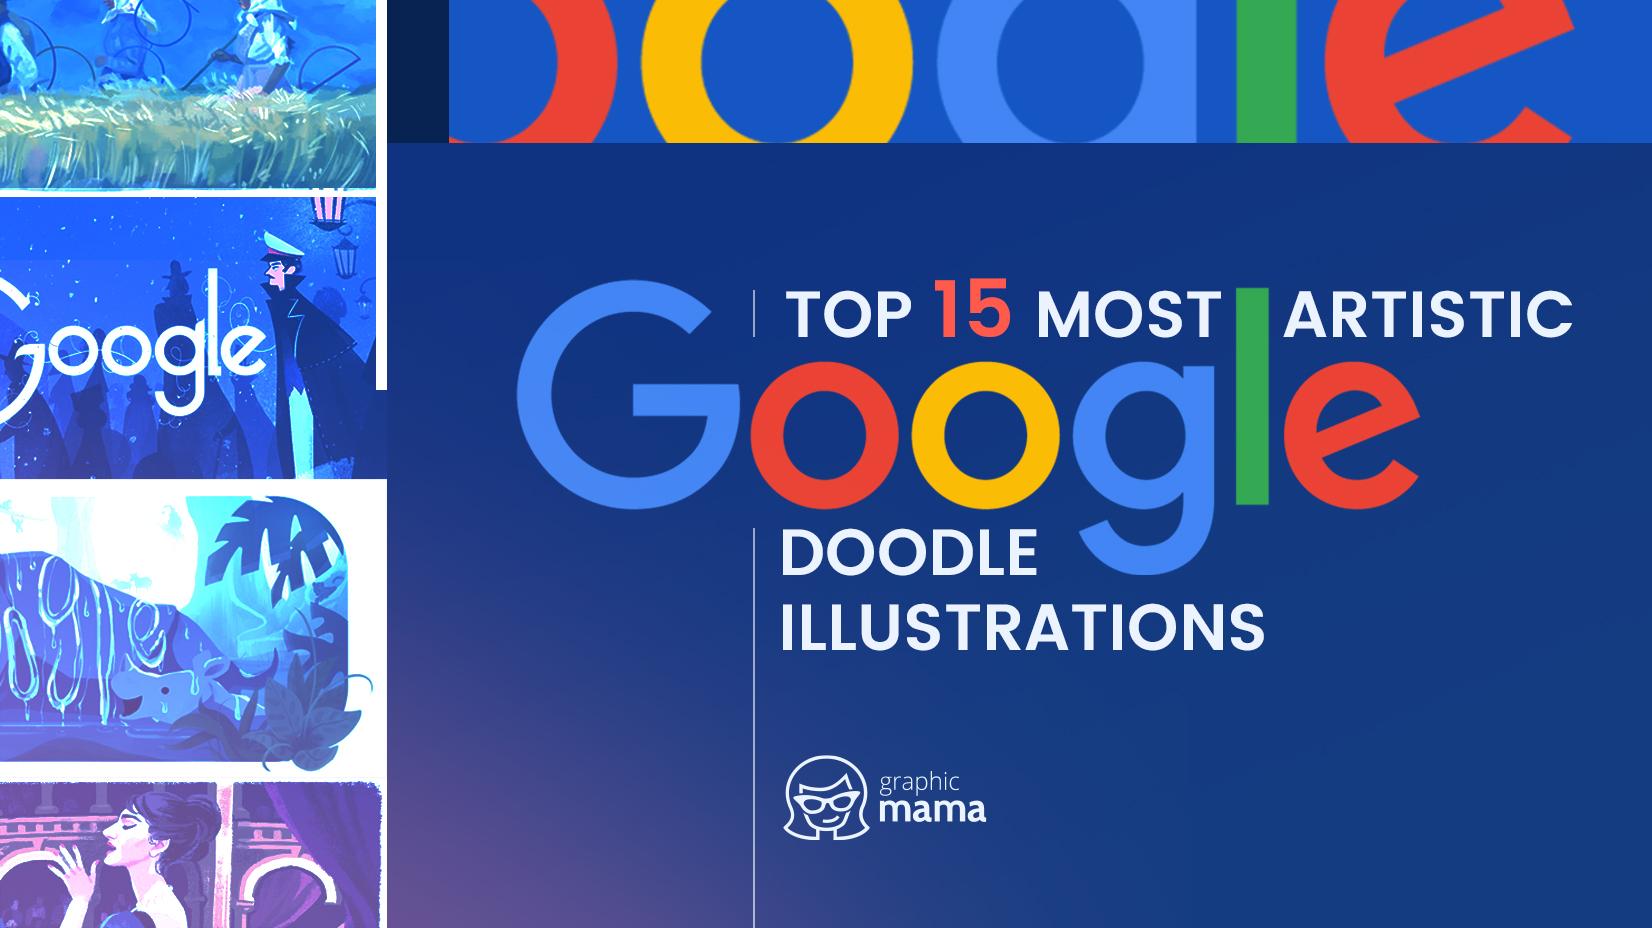 Top 15 Most Artistic Google Doodle Illustrations We've Seen